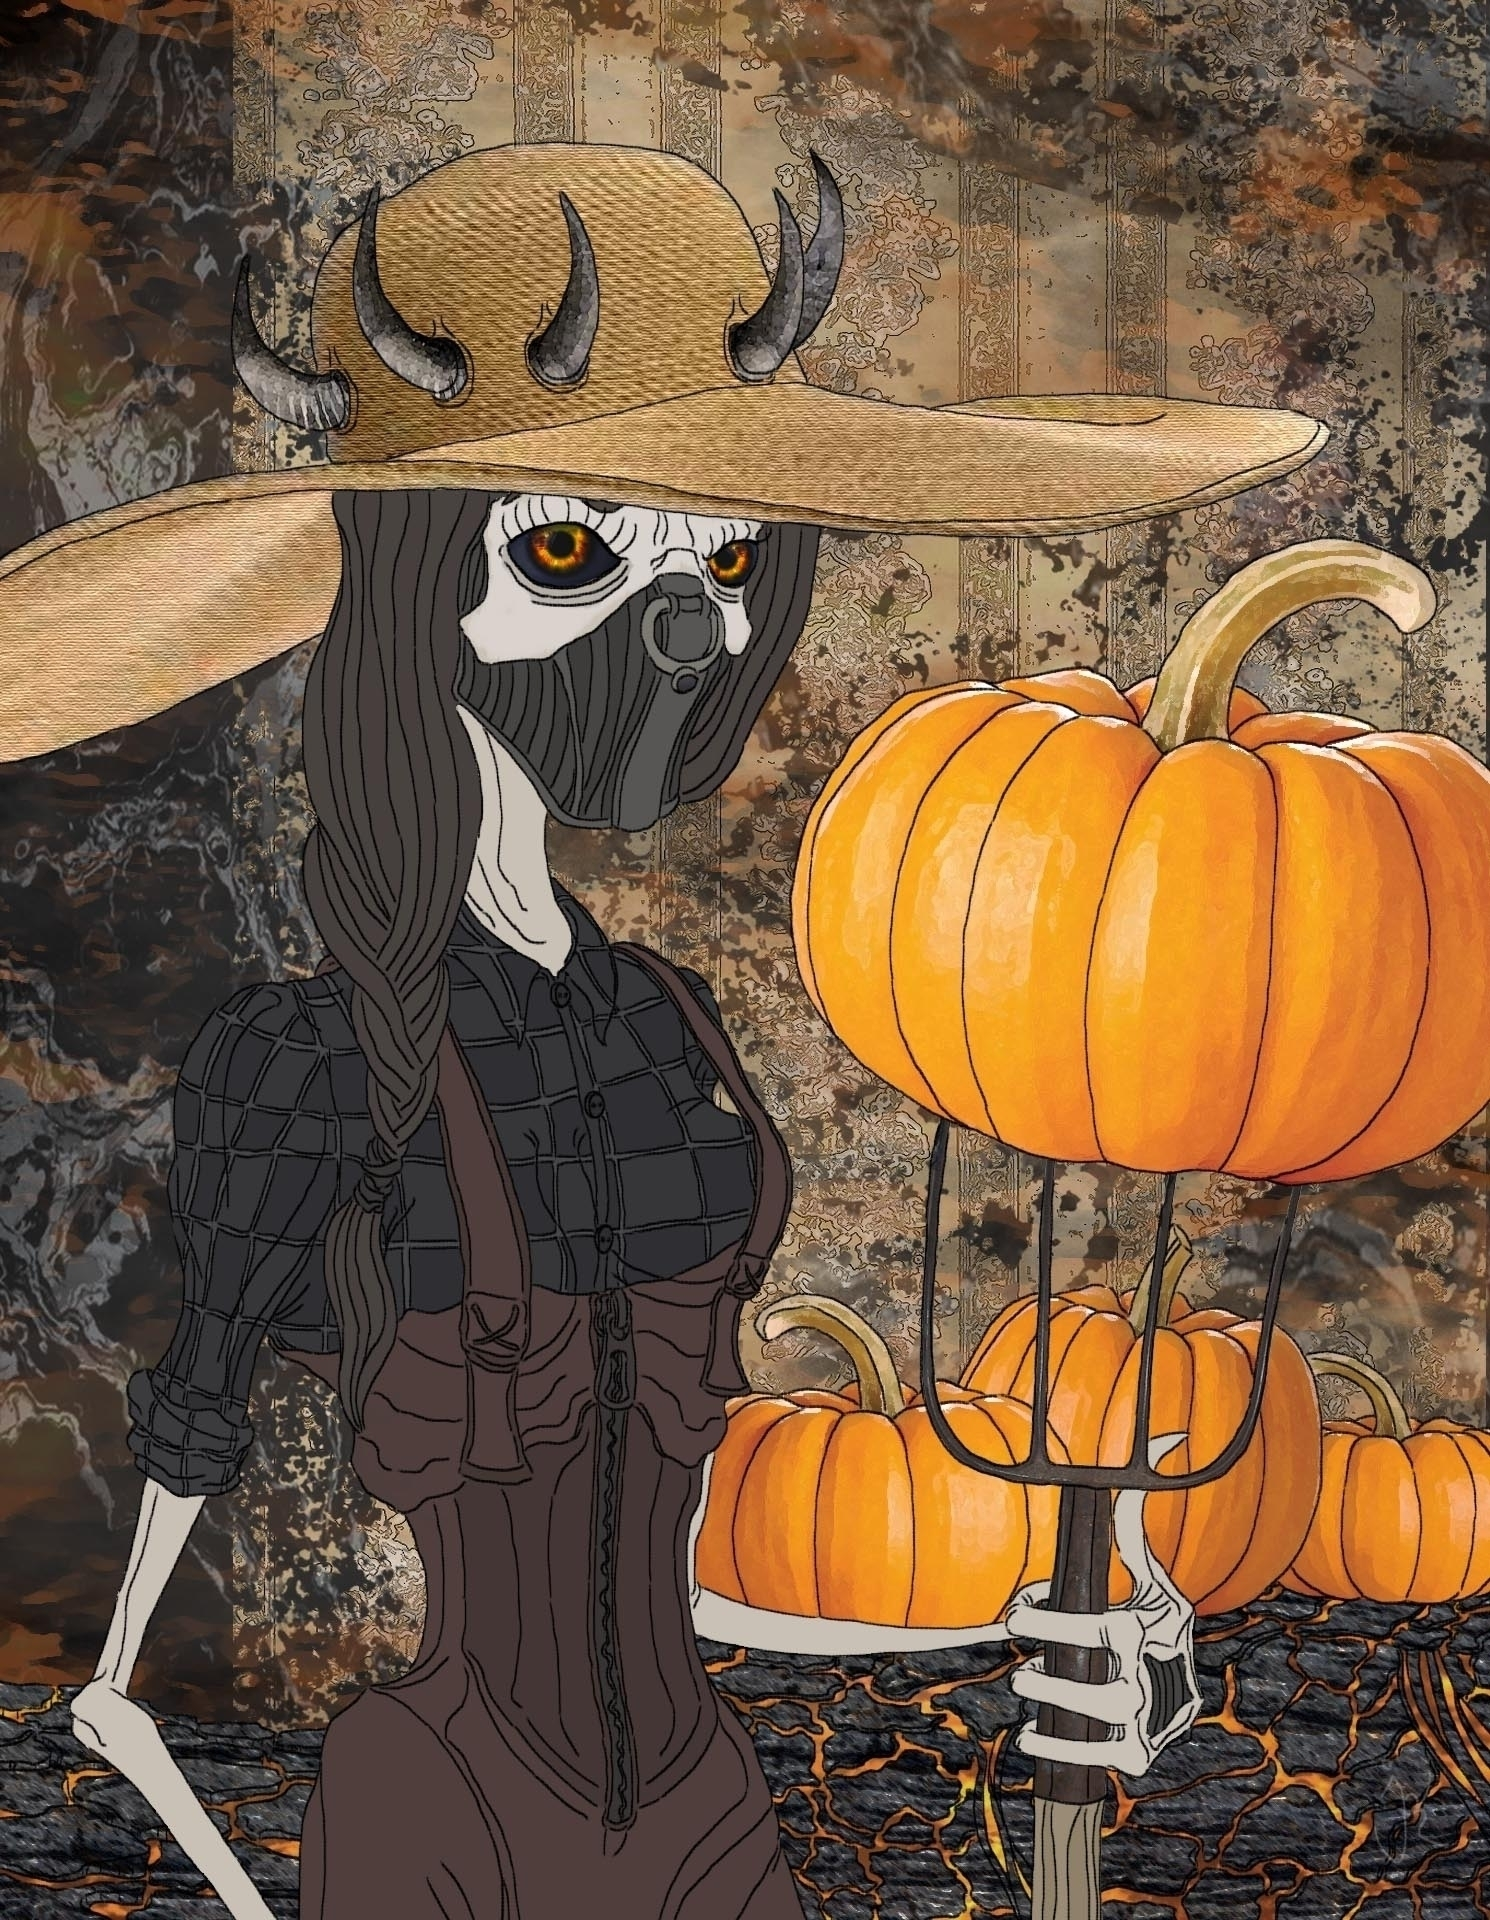 Pumpkin Patch Jenny - Portrait  - ristoky | ello